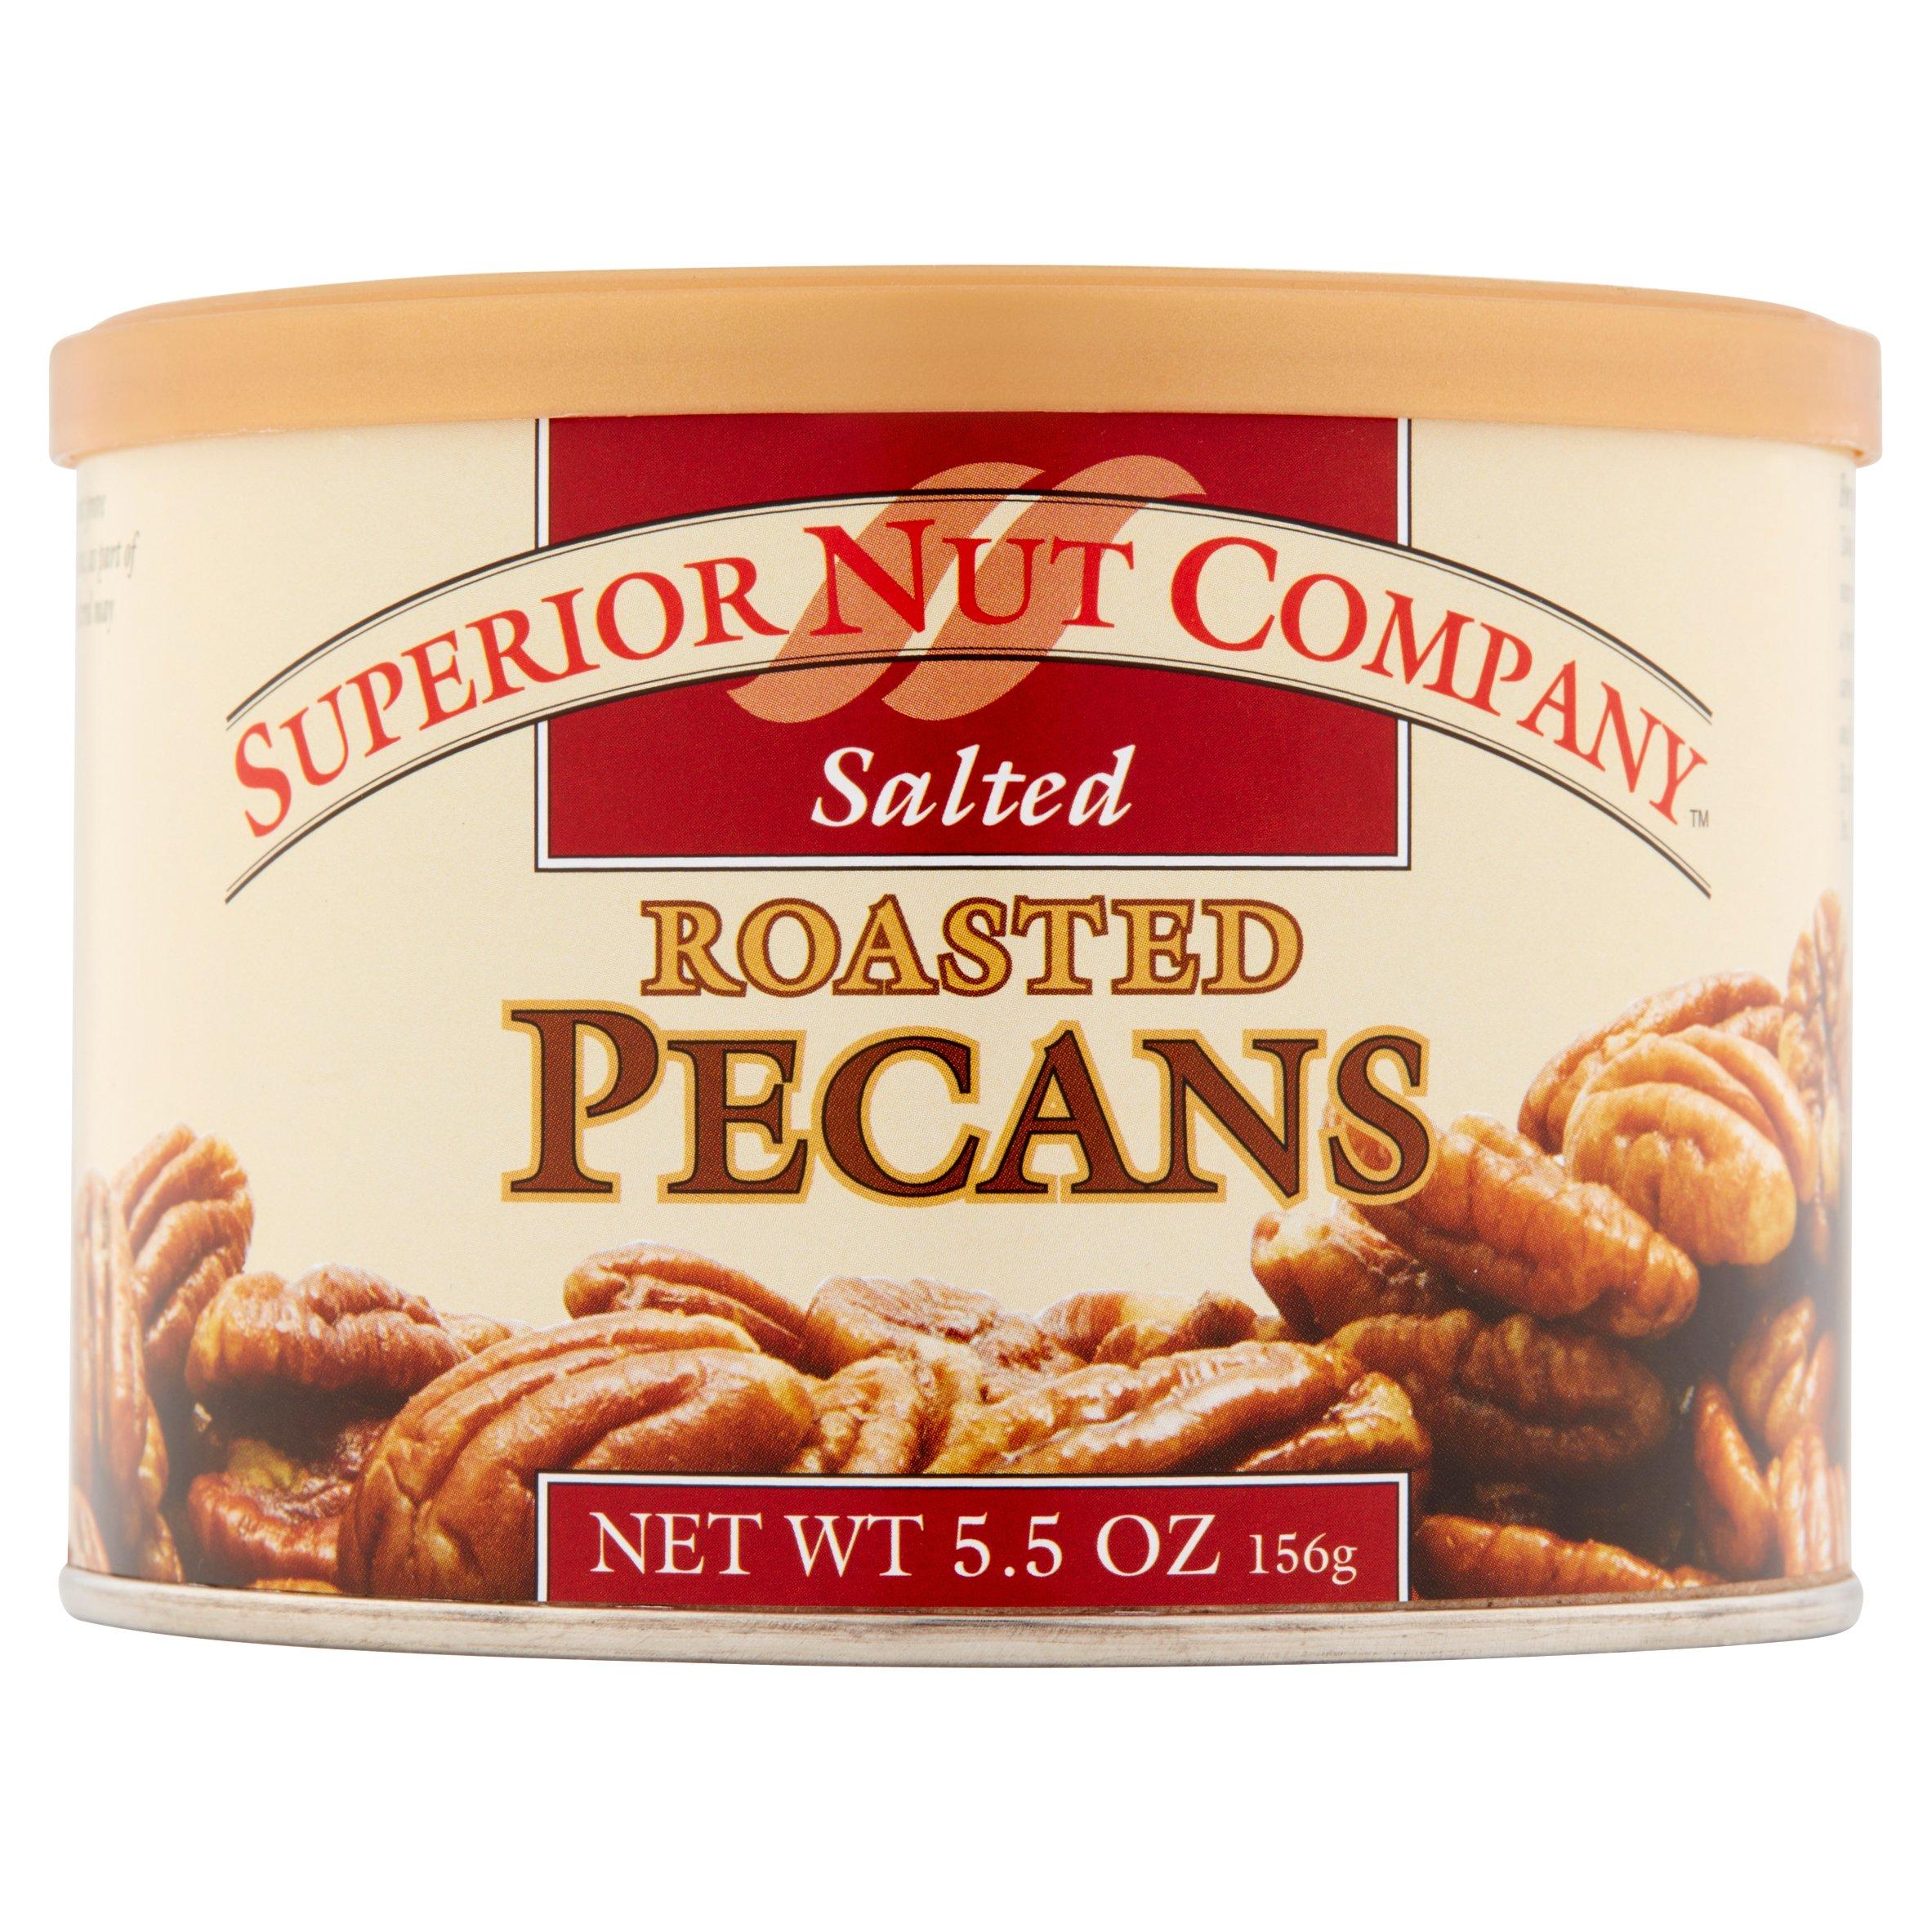 (6 Pack) Superior Nut Roasted Salted Pecans, 5.5 oz